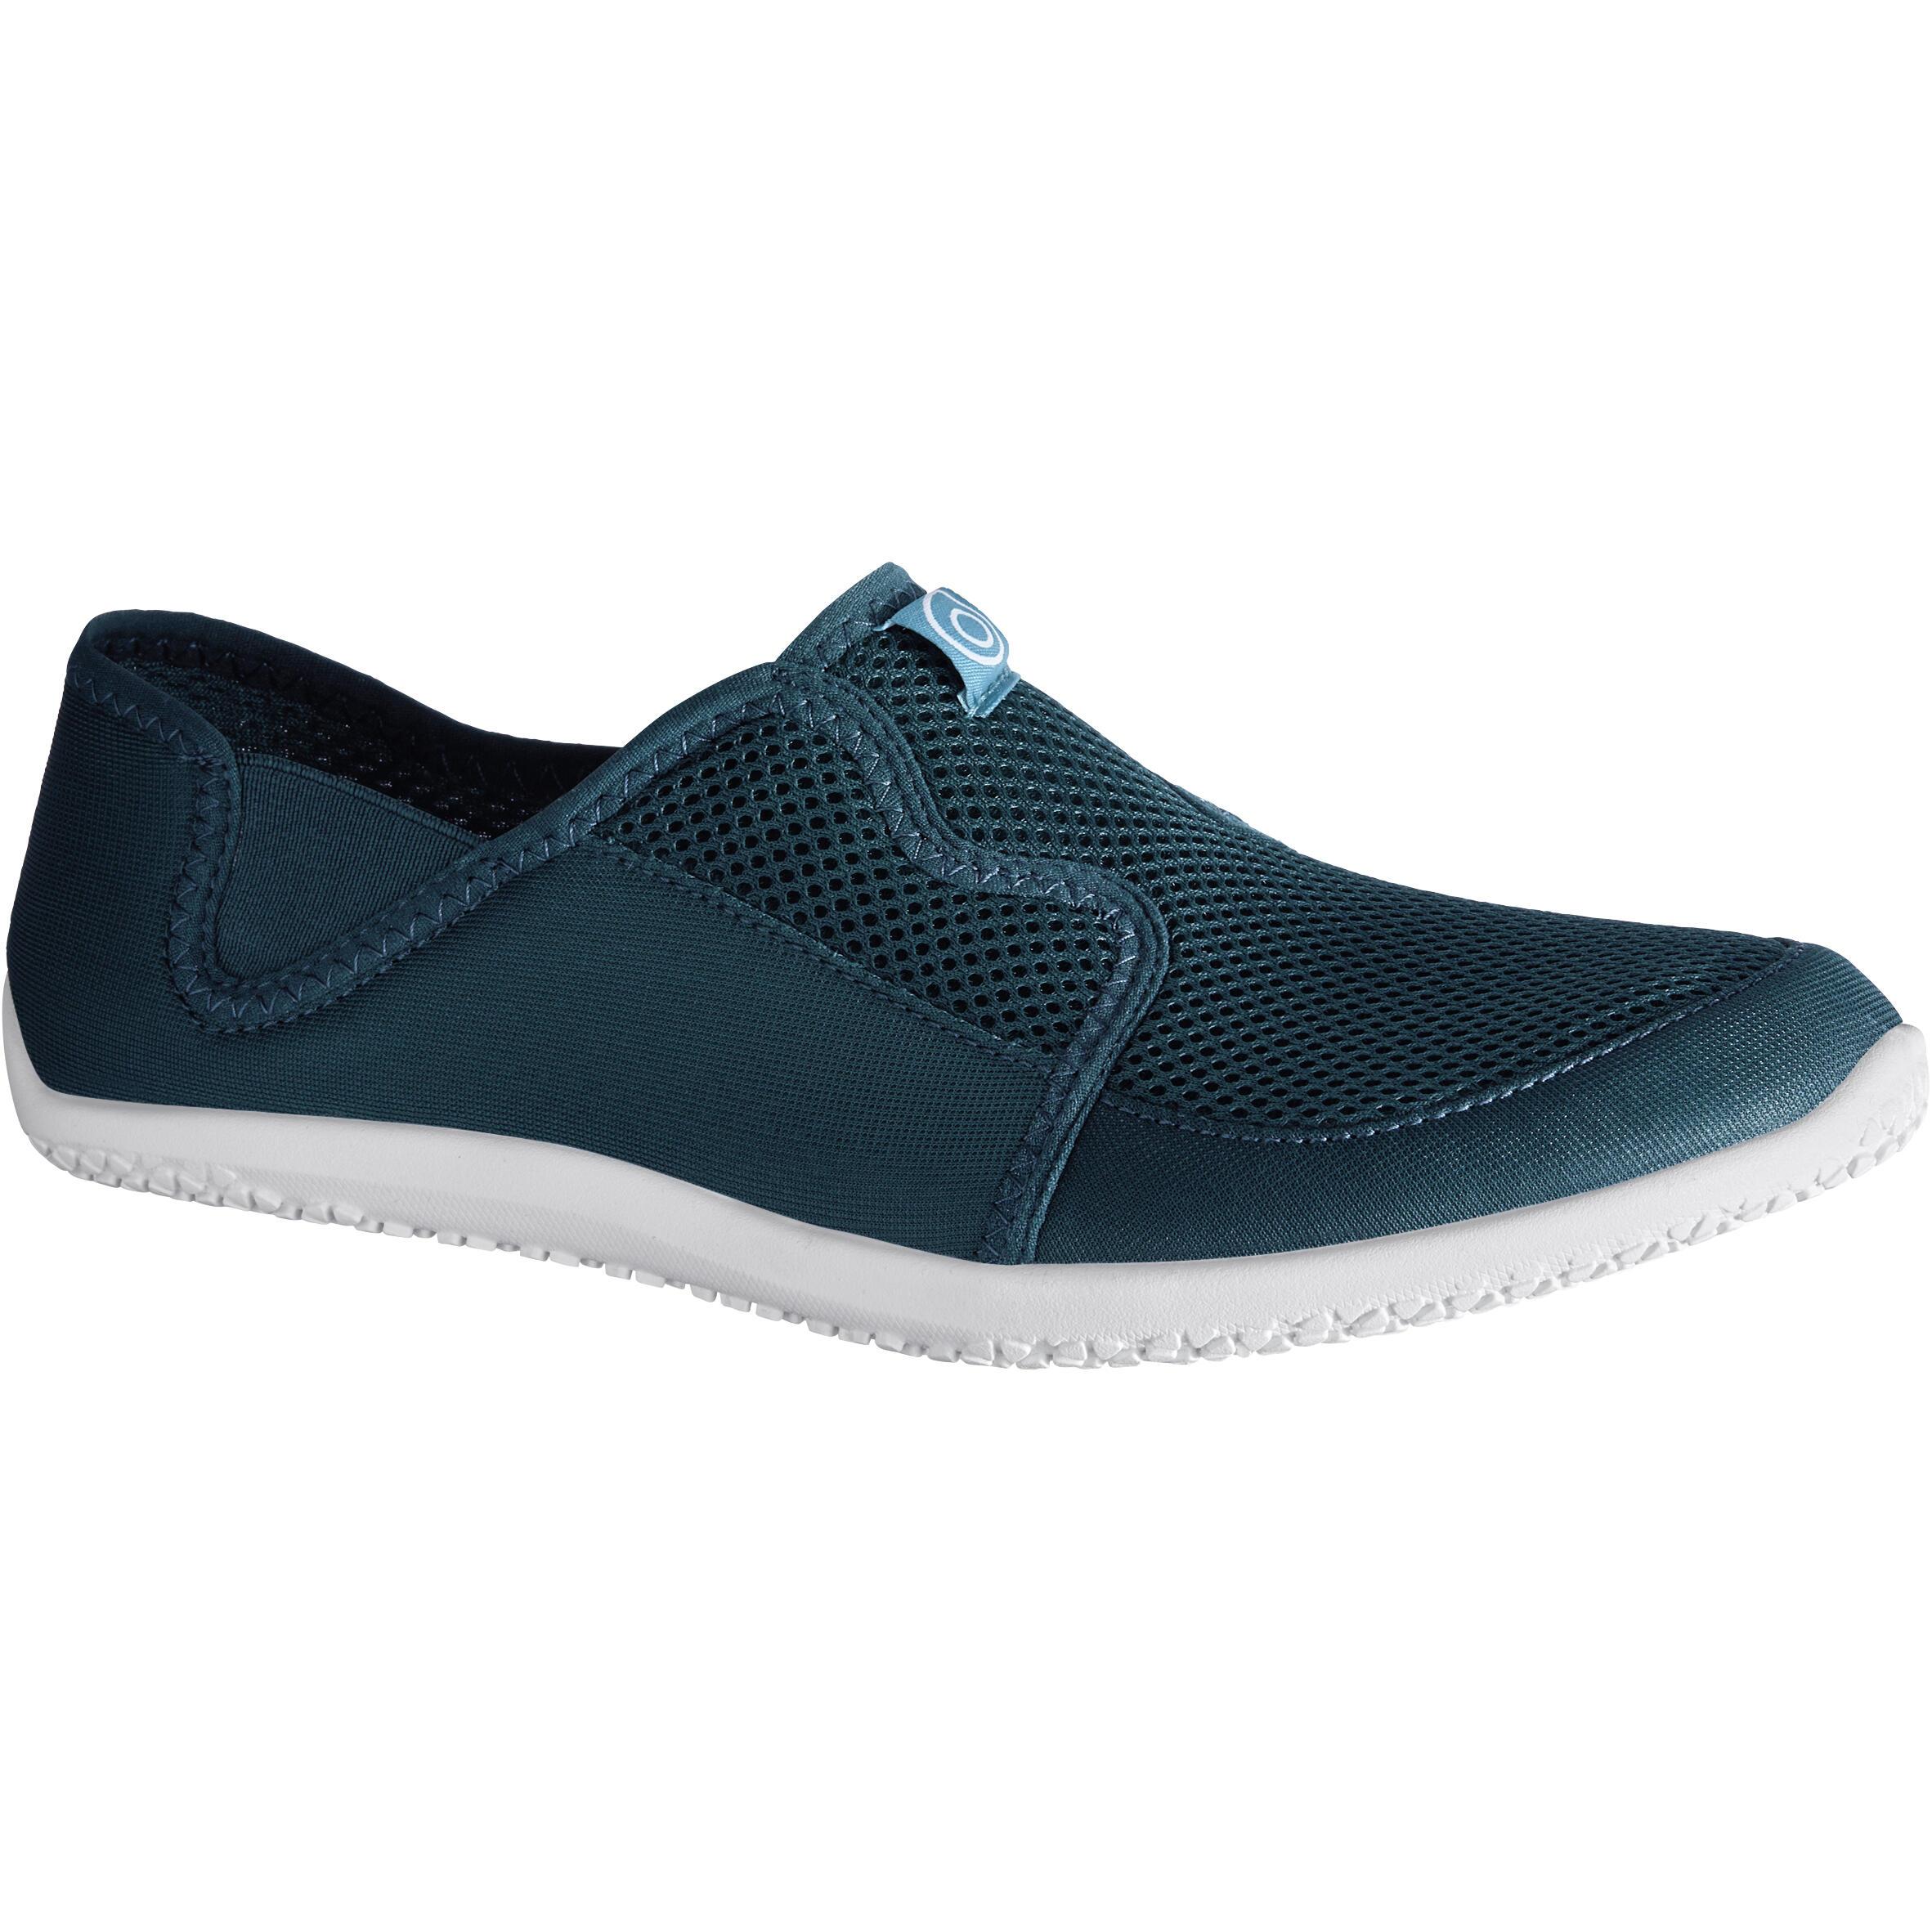 Aquashoes chaussures aquatiques 120 adulte turquoises foncées - Subea